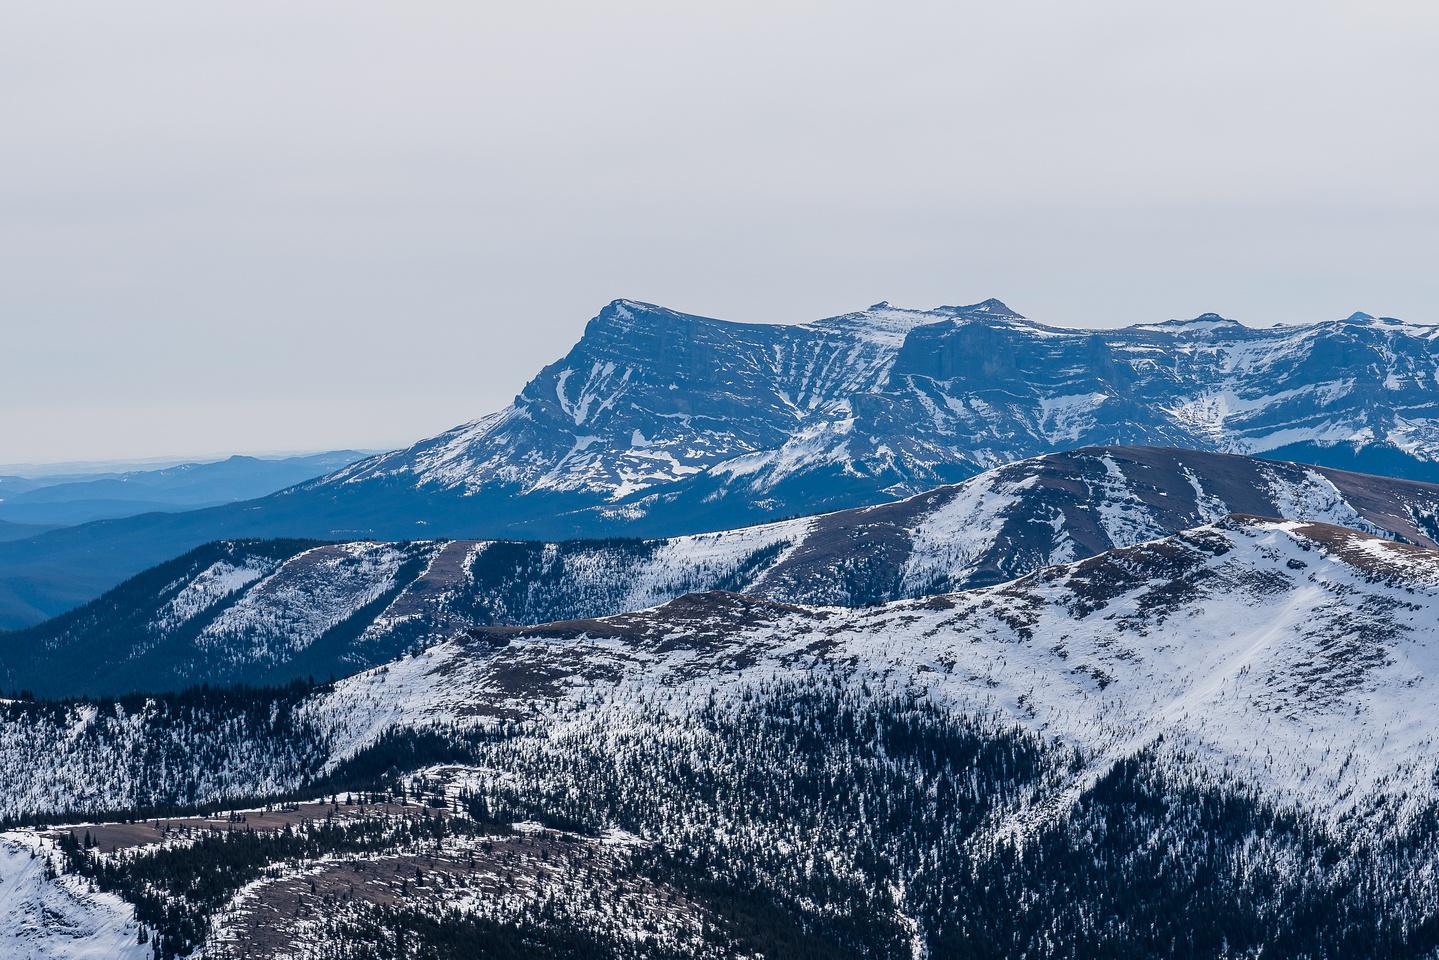 Ghost (Kink) Peak.